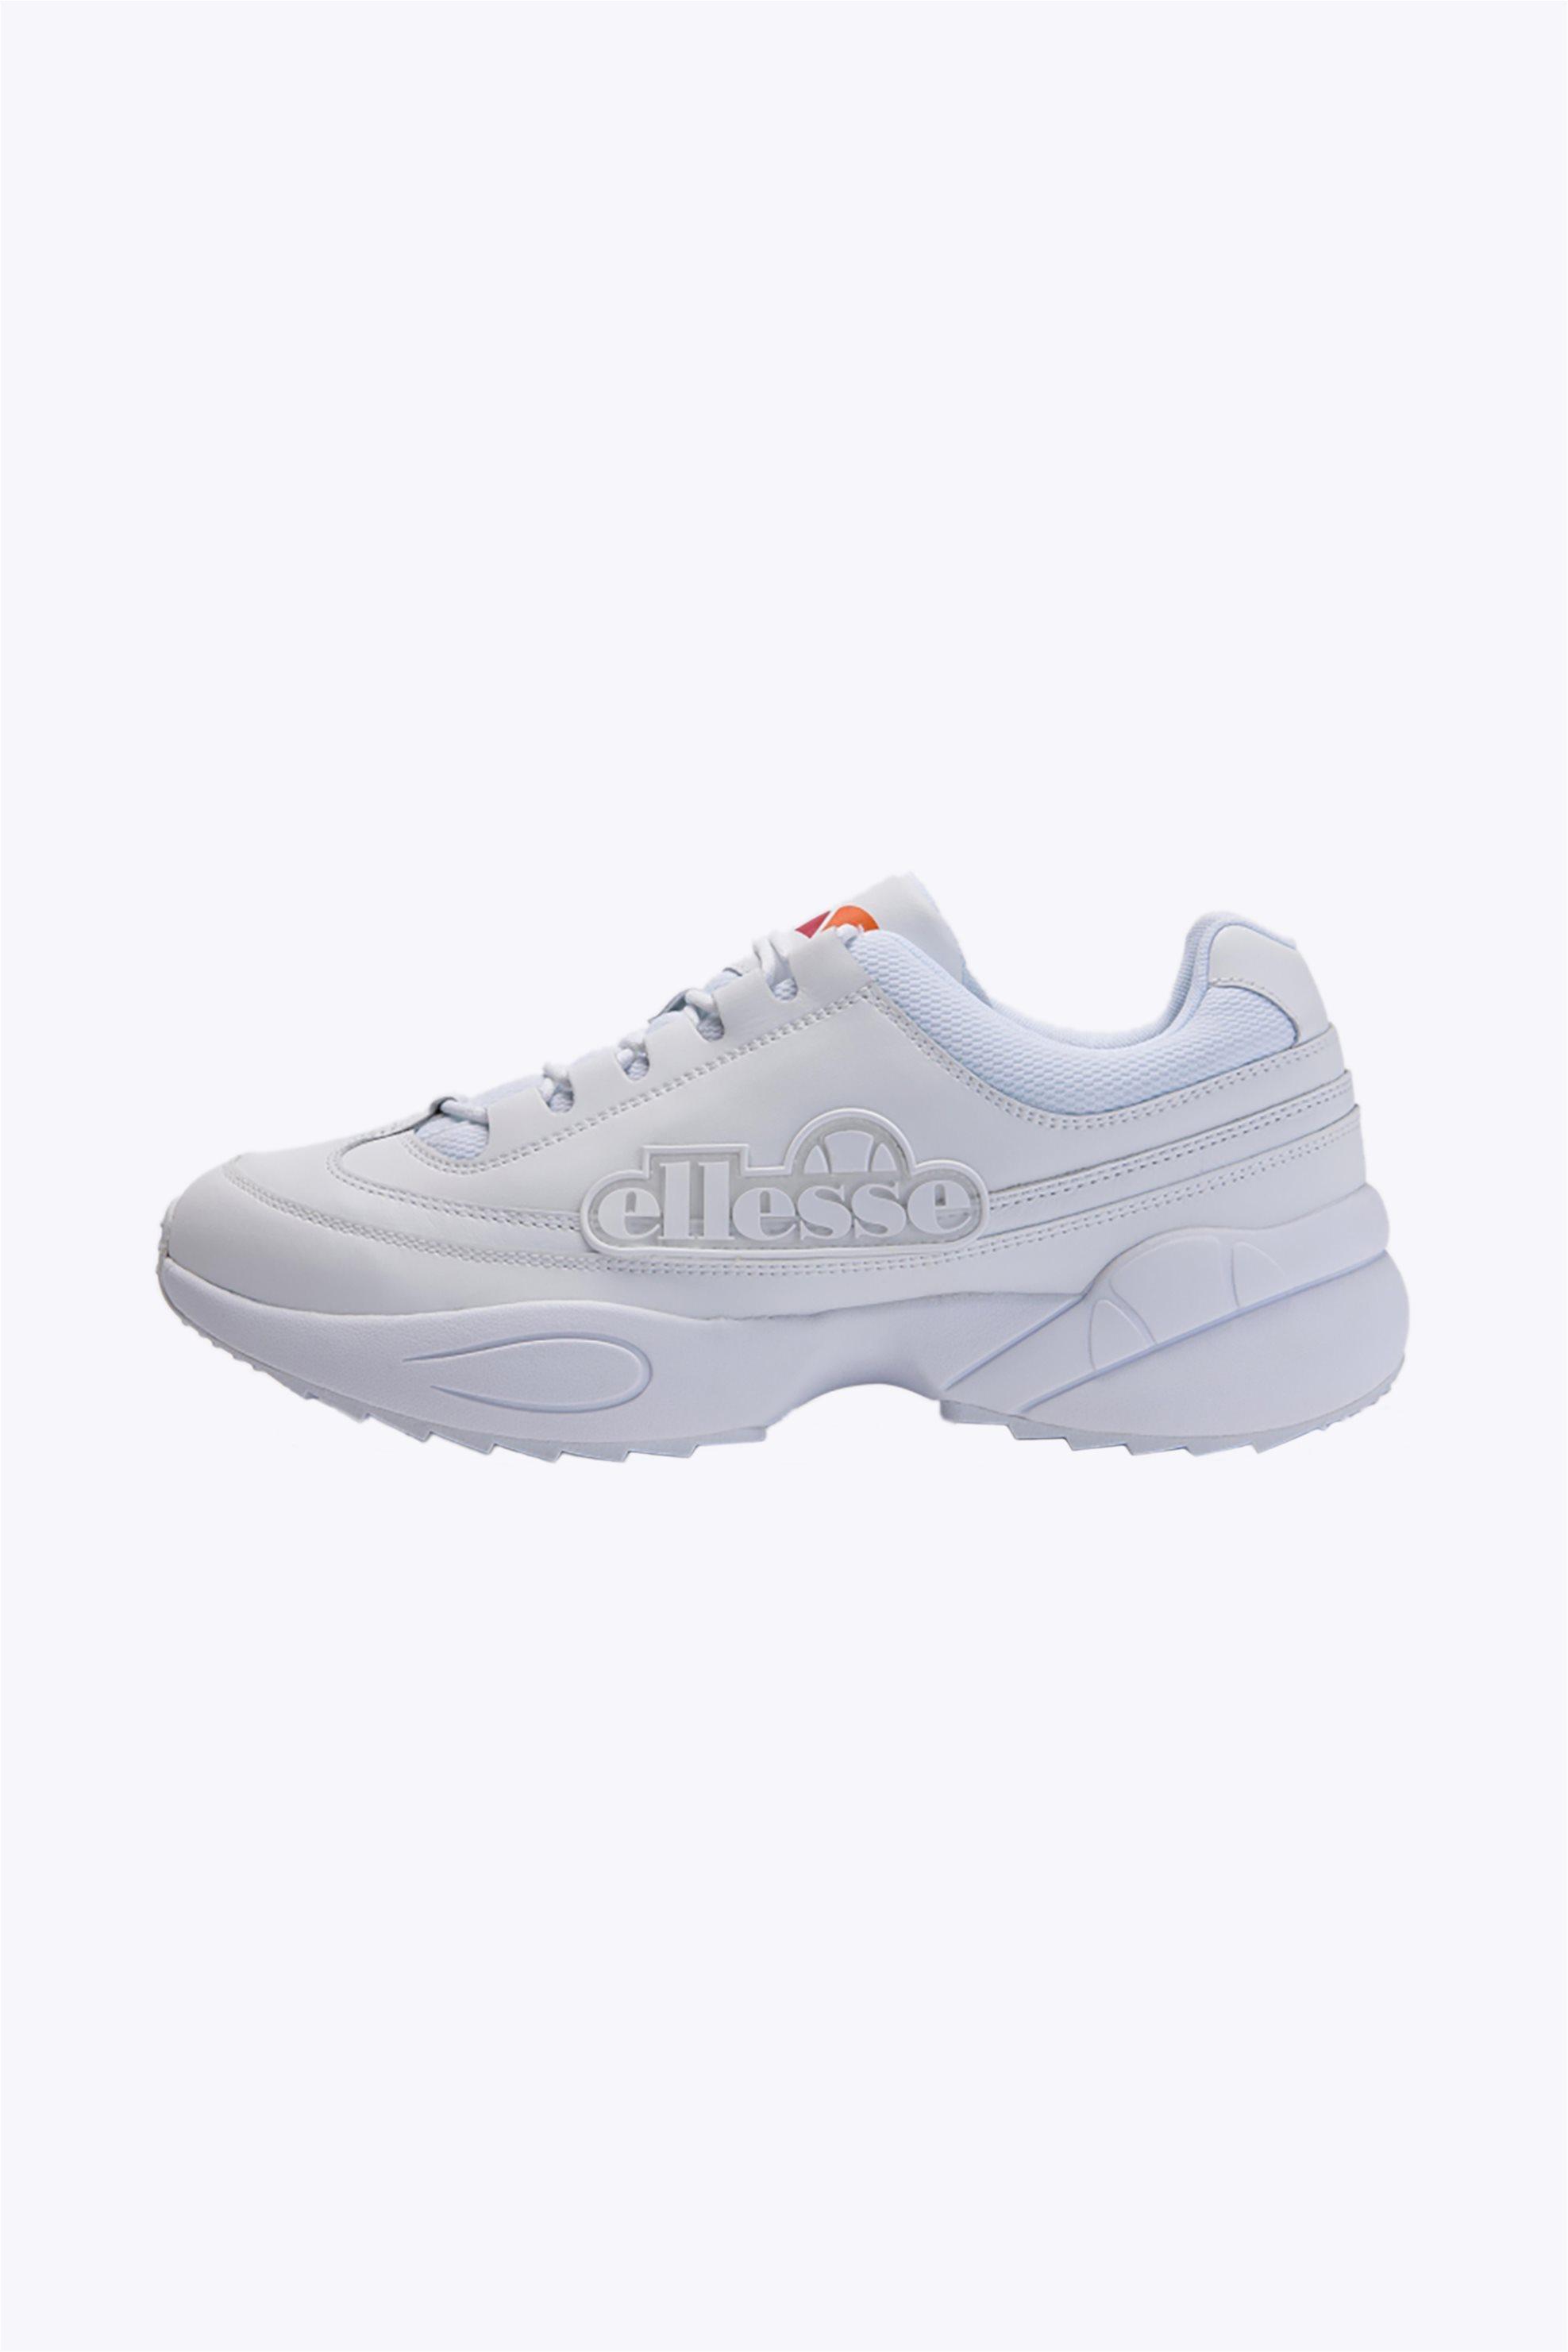 "Ellesse ανδρικά δερμάτινα sneakers ""Sparta"" – 613656 – Λευκό"